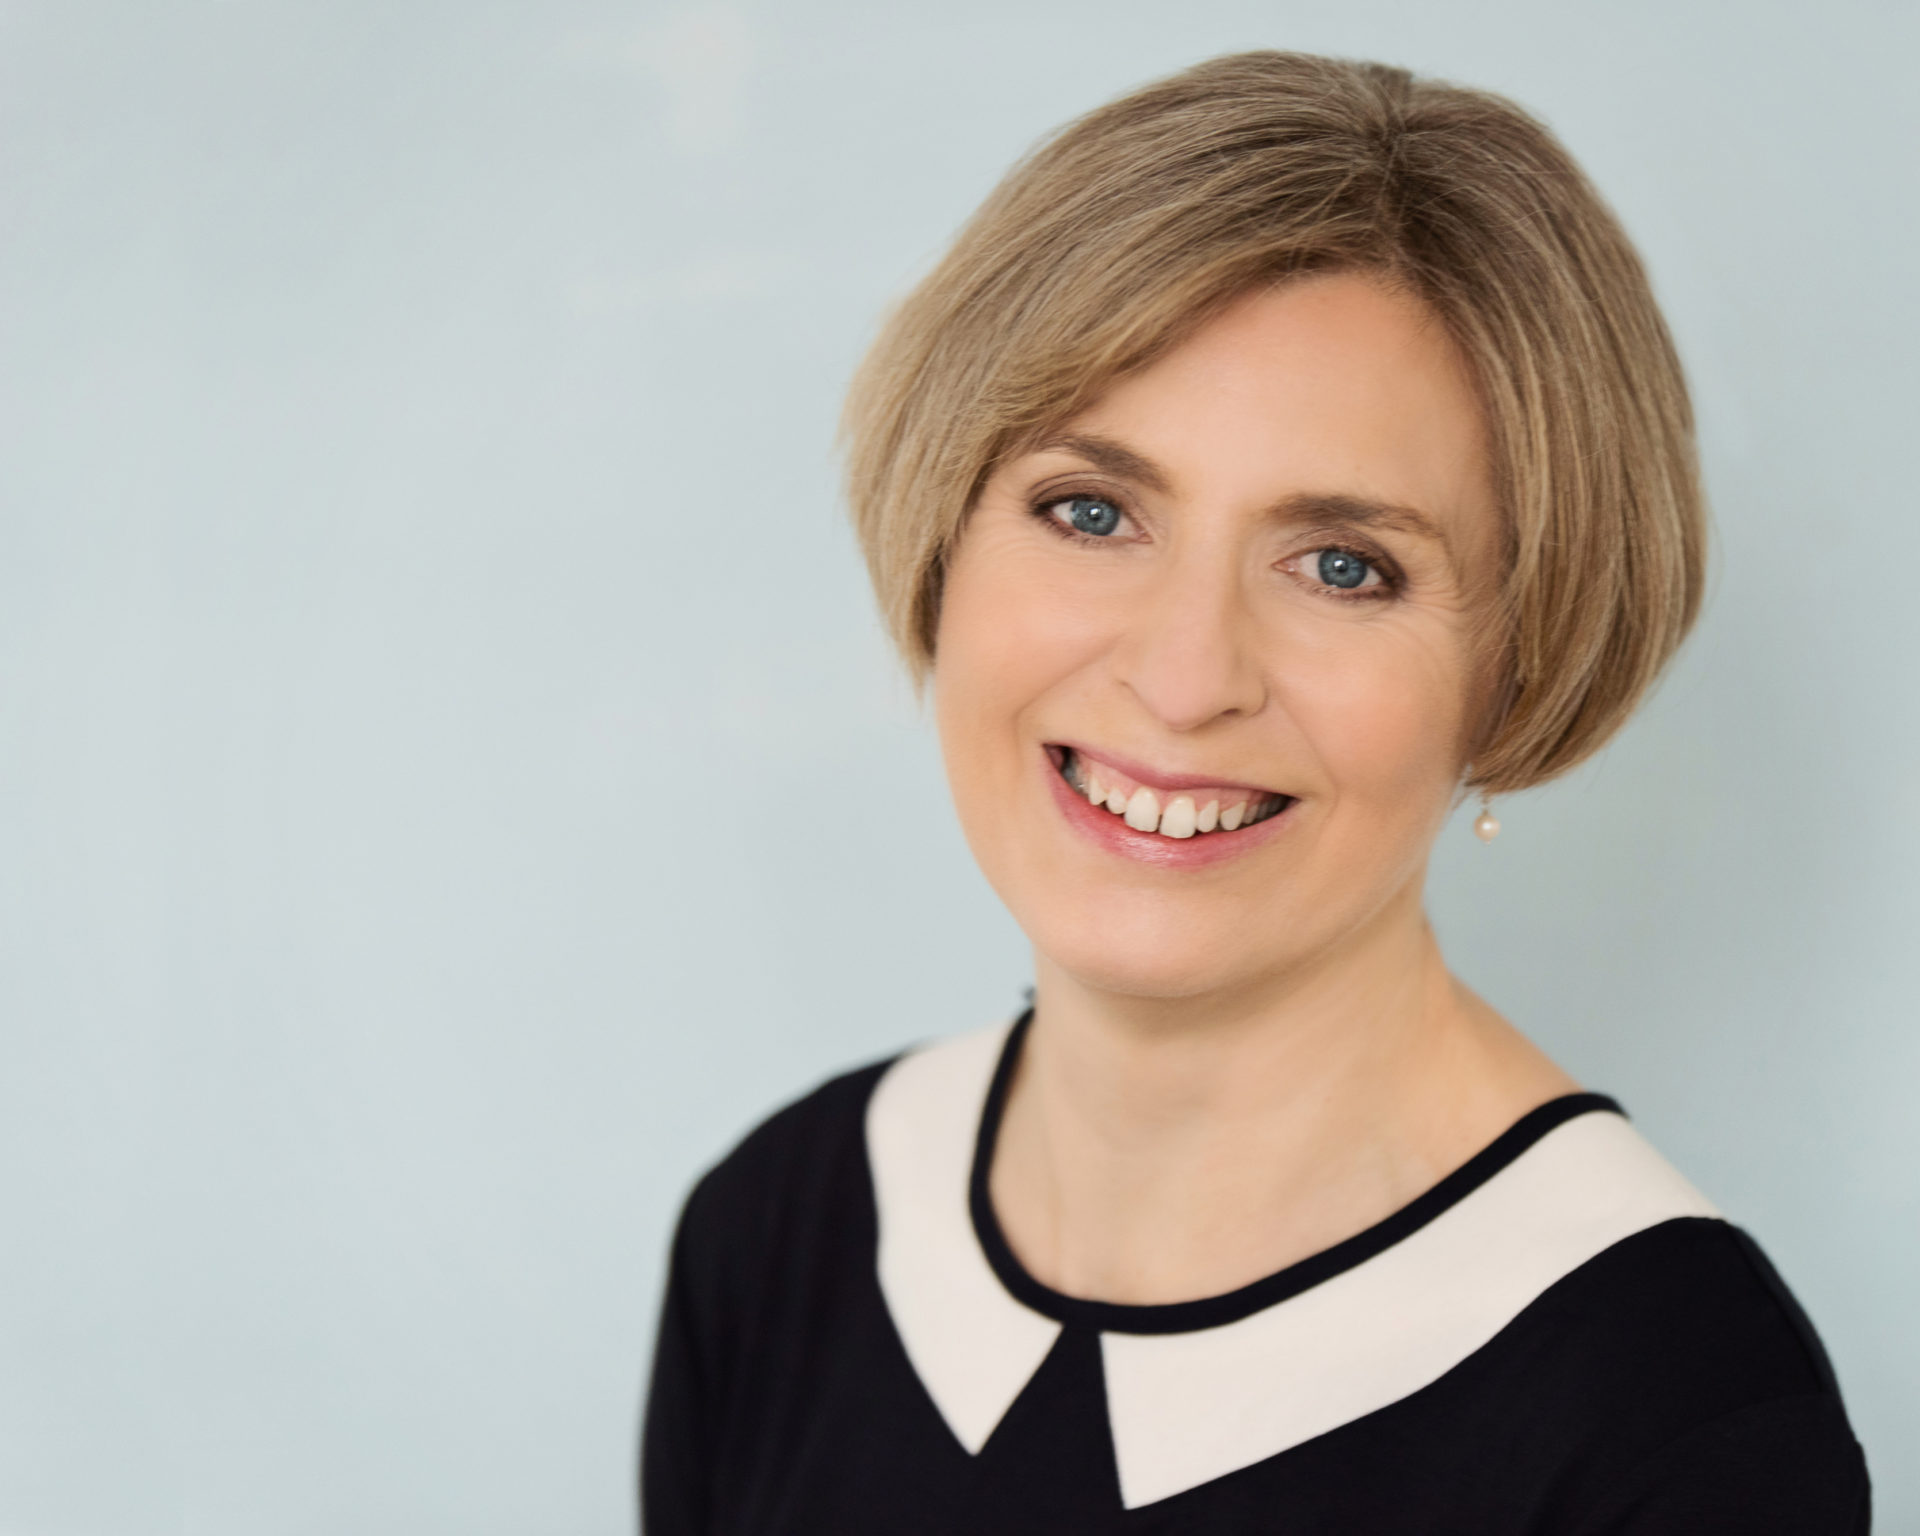 Lynne Gordon, Office Manager, Re:Accounts Ltd